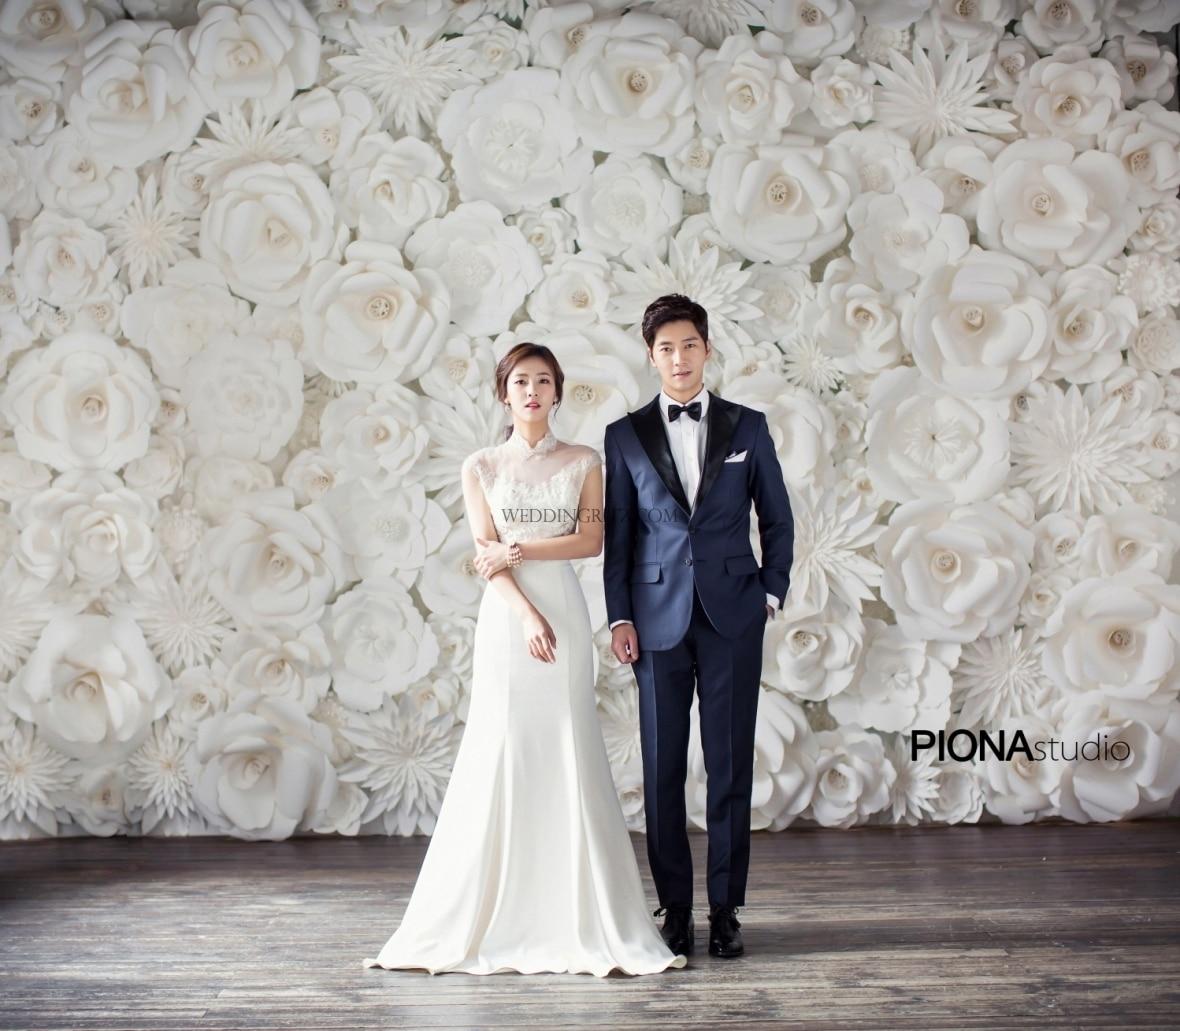 128pcs set gaint wedding paper flowers wall handmade diy mix flowers aeproducttsubject mightylinksfo